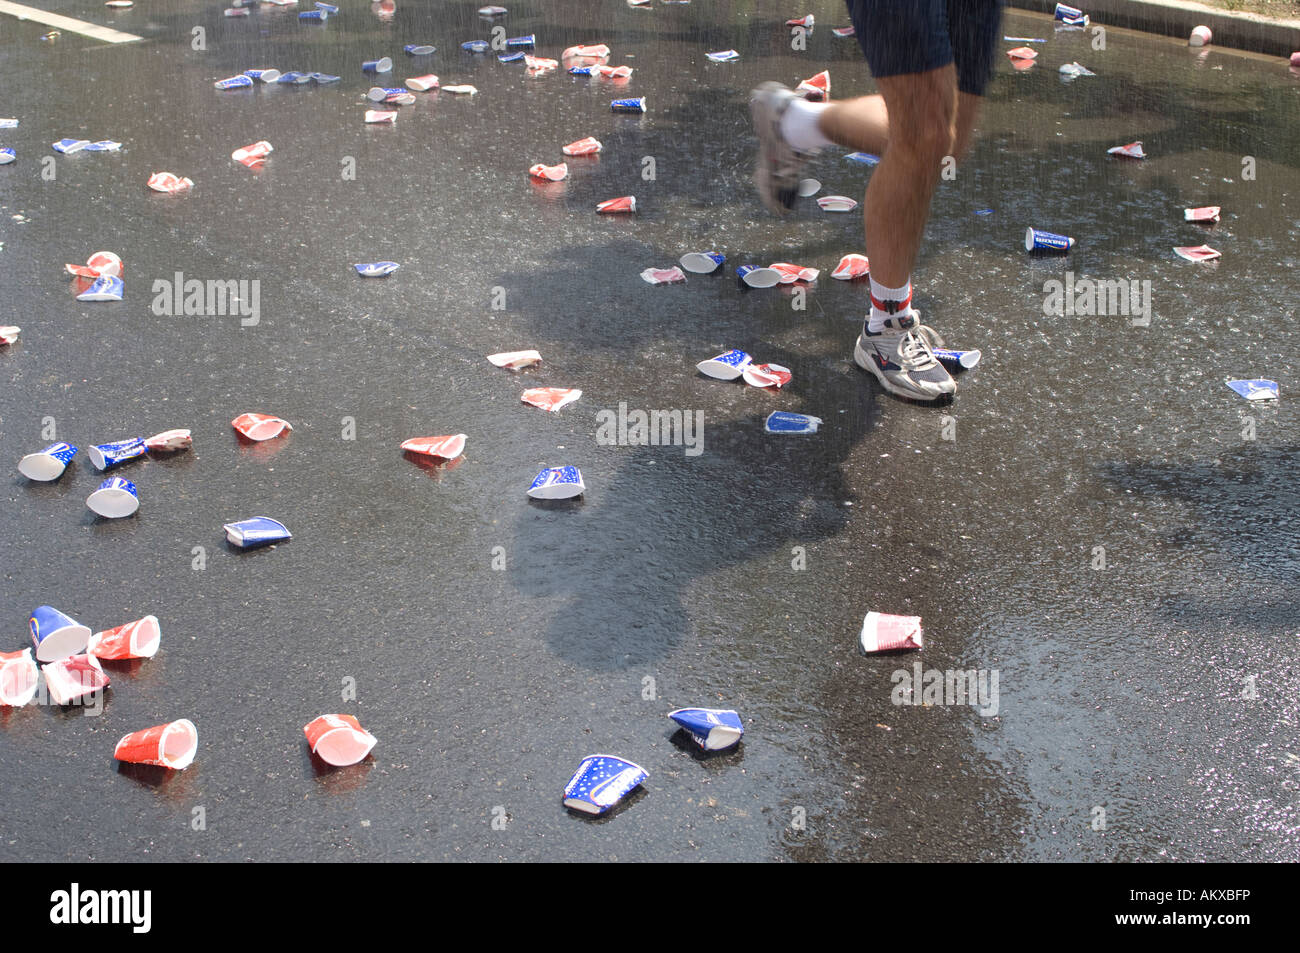 Delayed Marathon runner - Stock Image